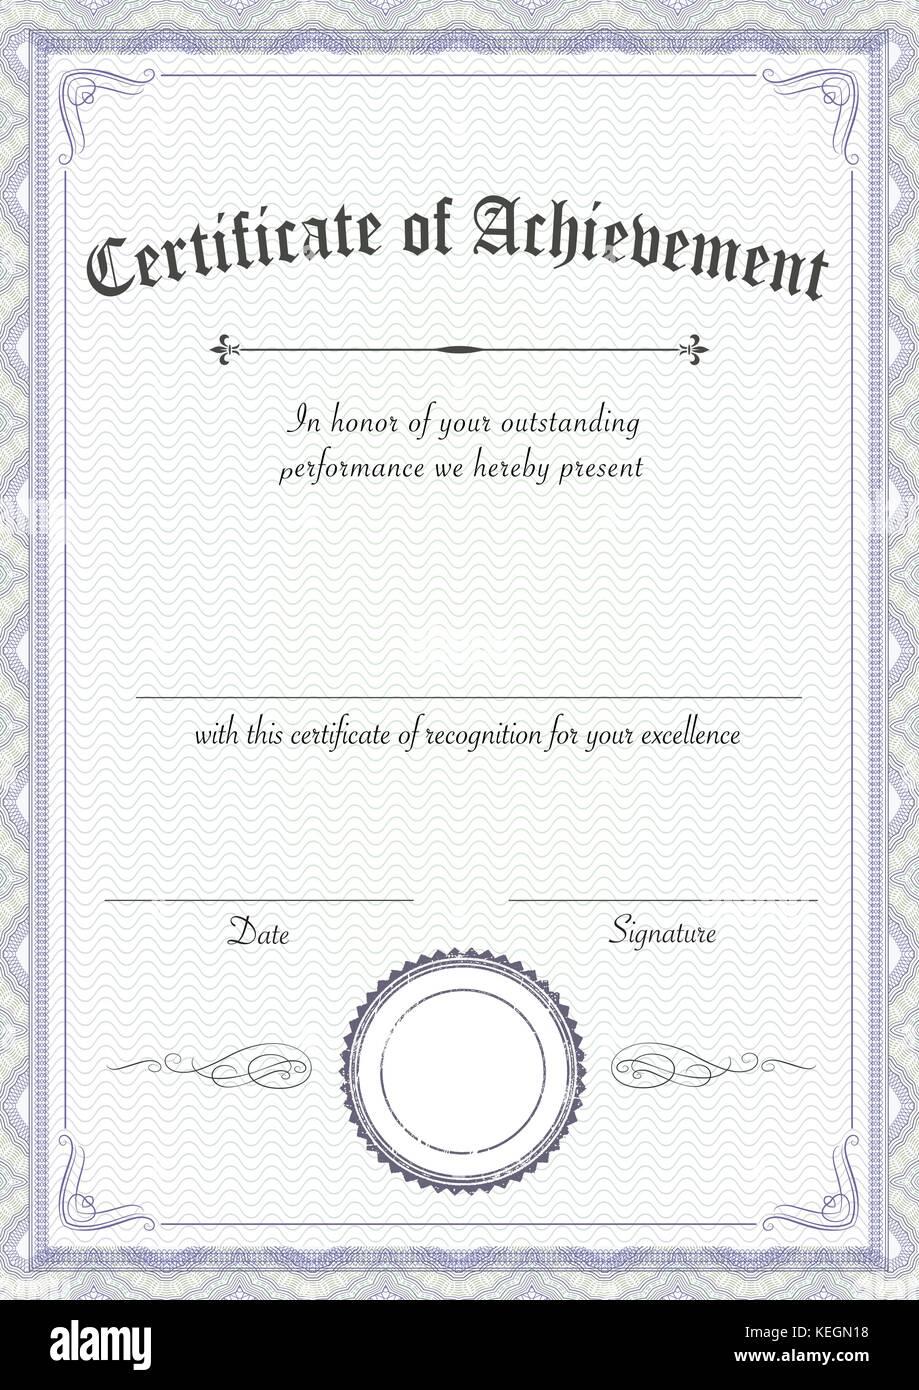 Certificate Border Certificate Template Vector Stock Photos ...